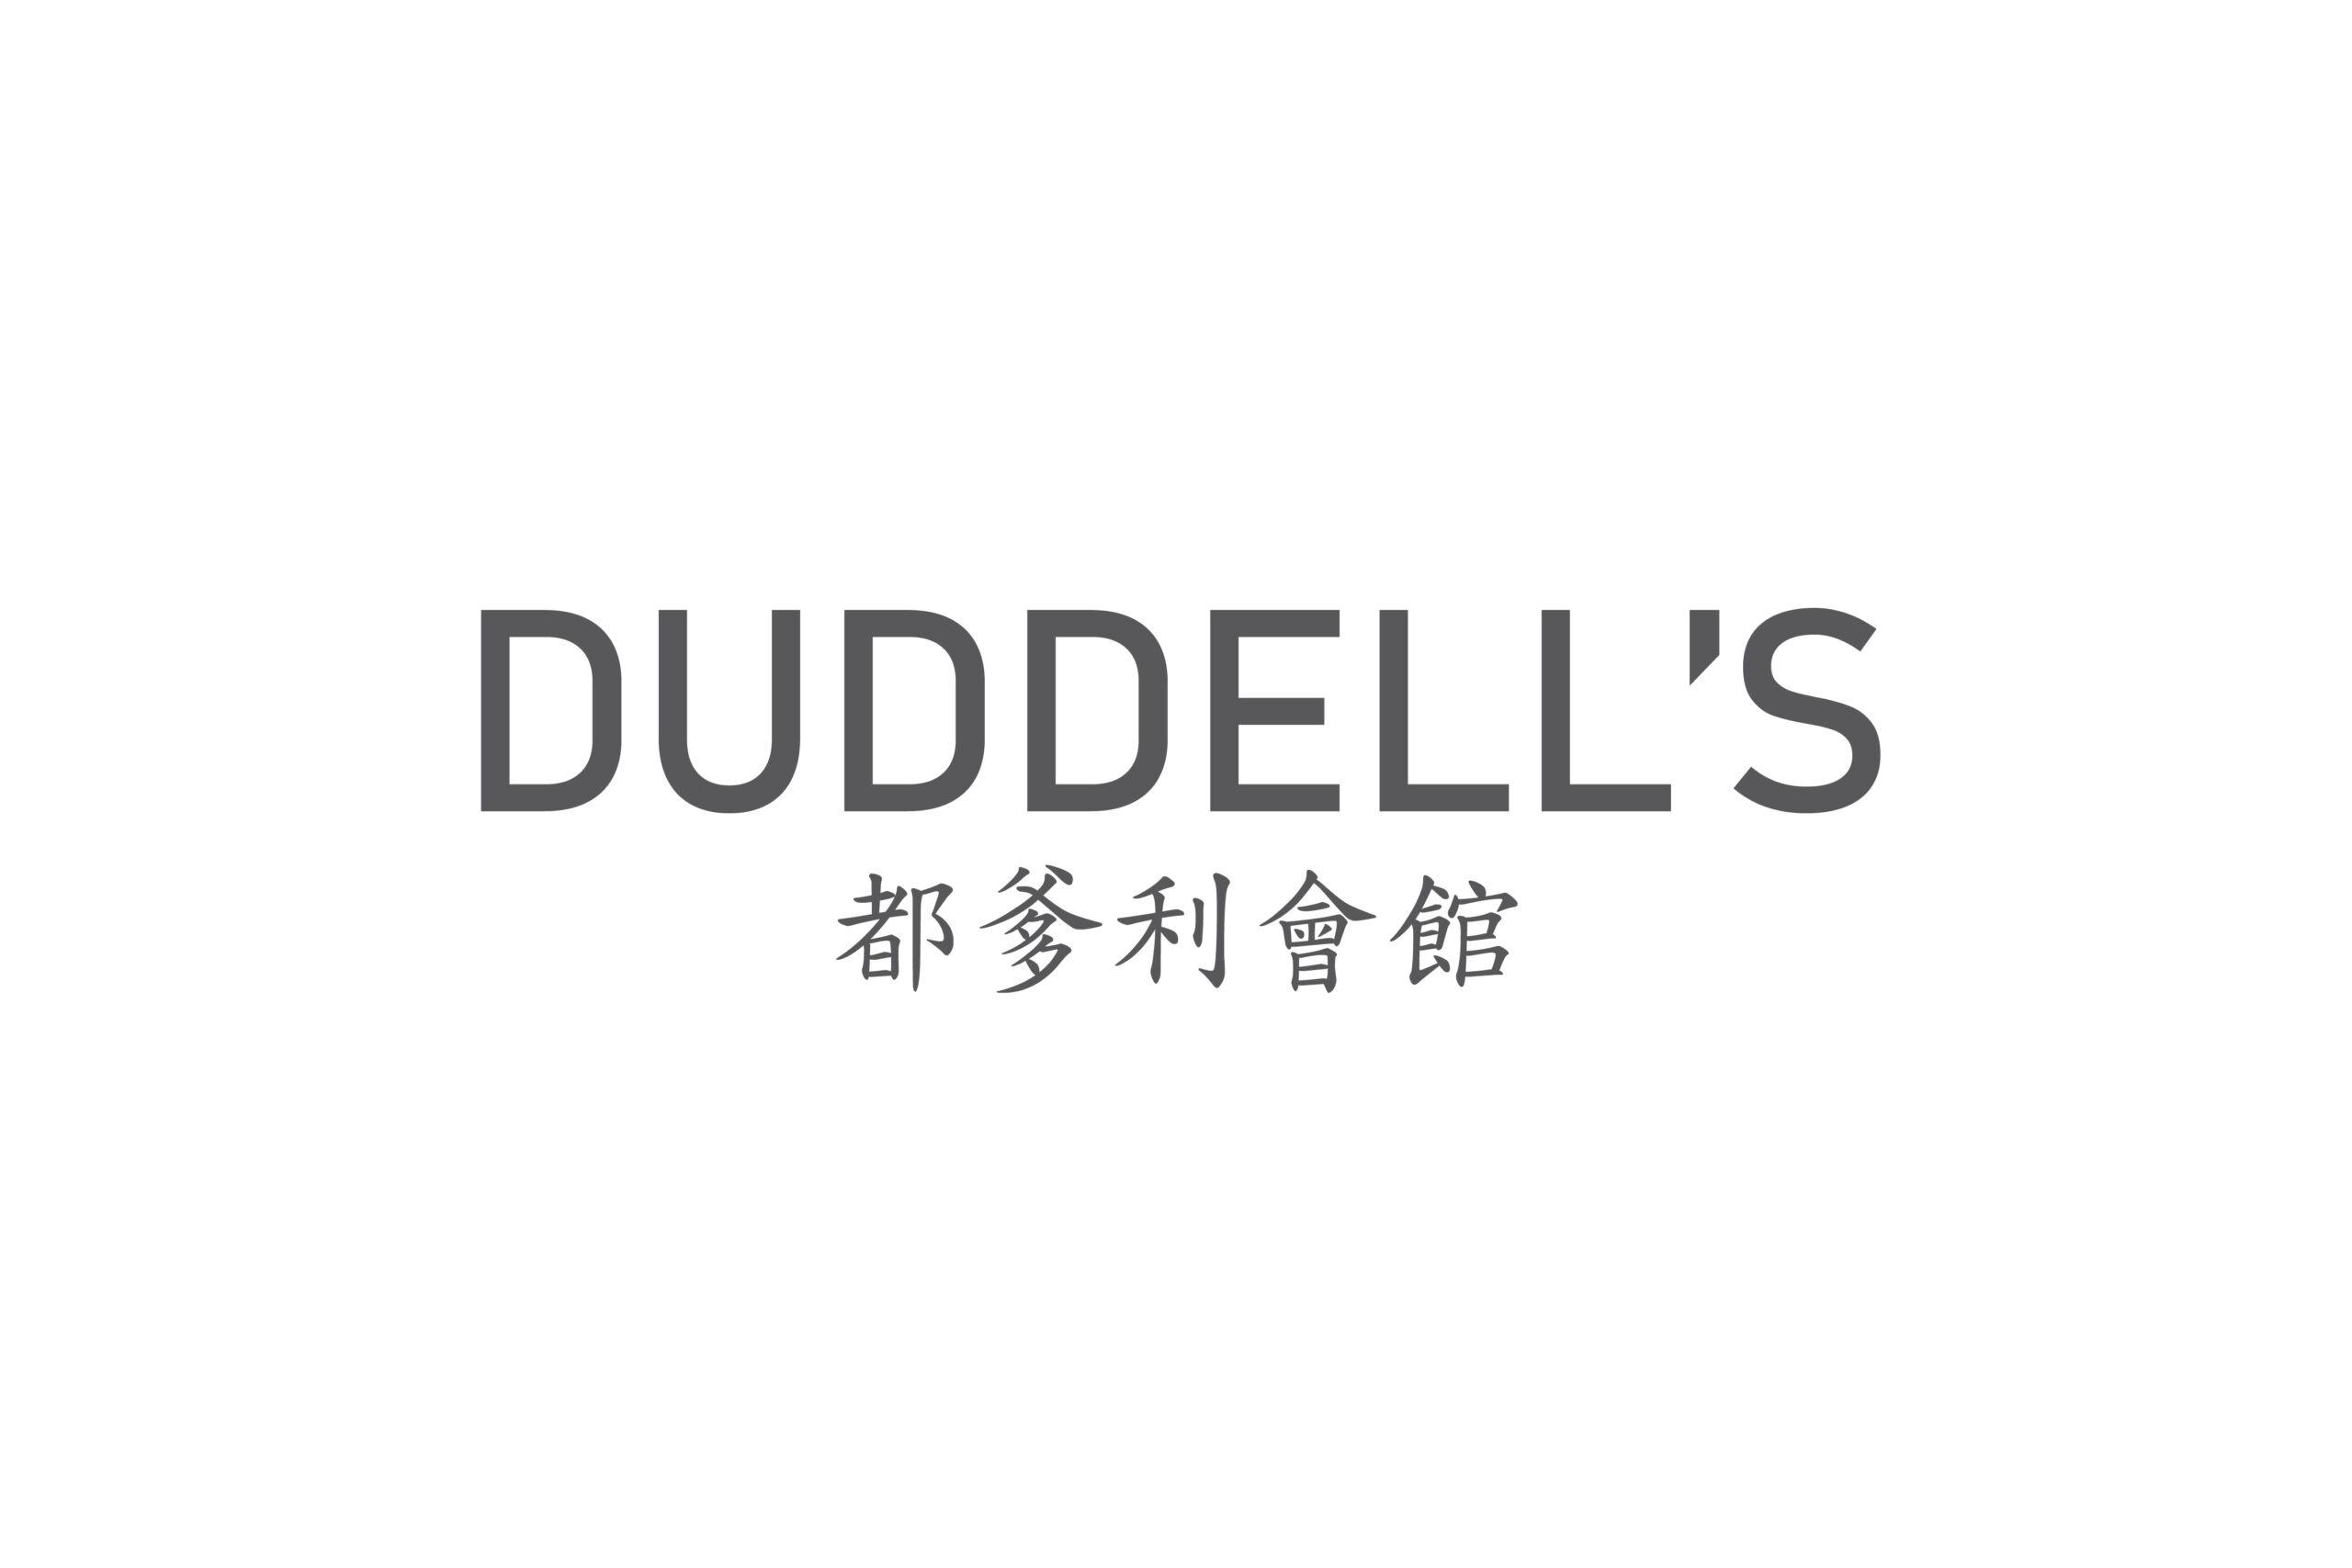 duddells-都爹-hk